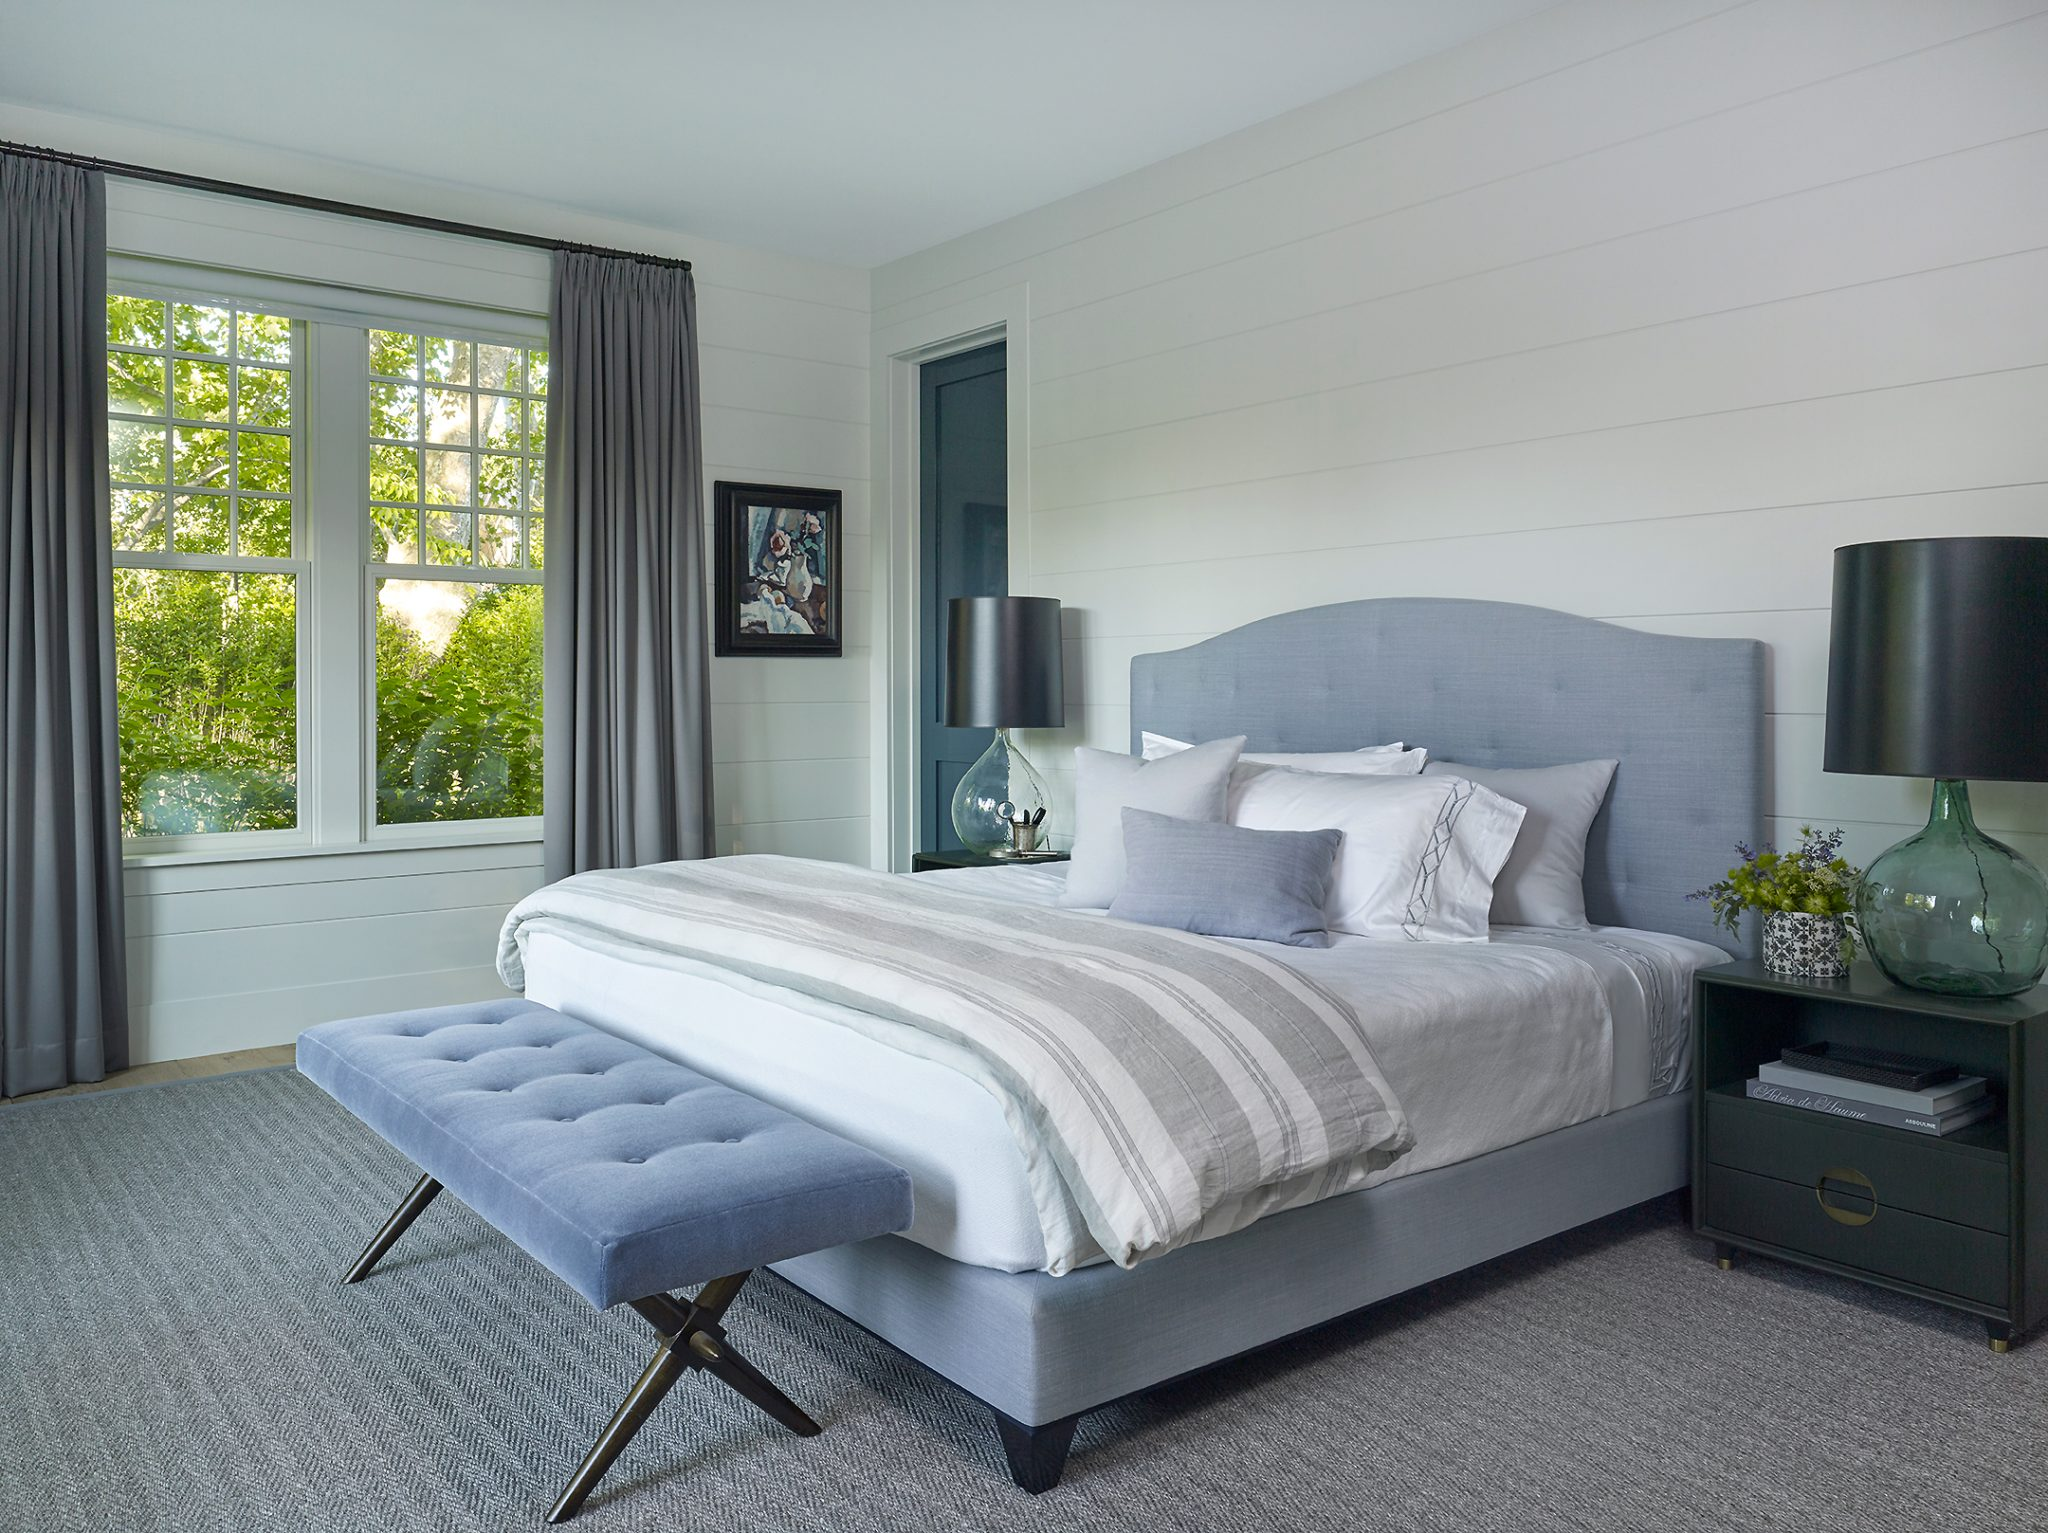 East Hampton bedroom by Dan Scotti Design